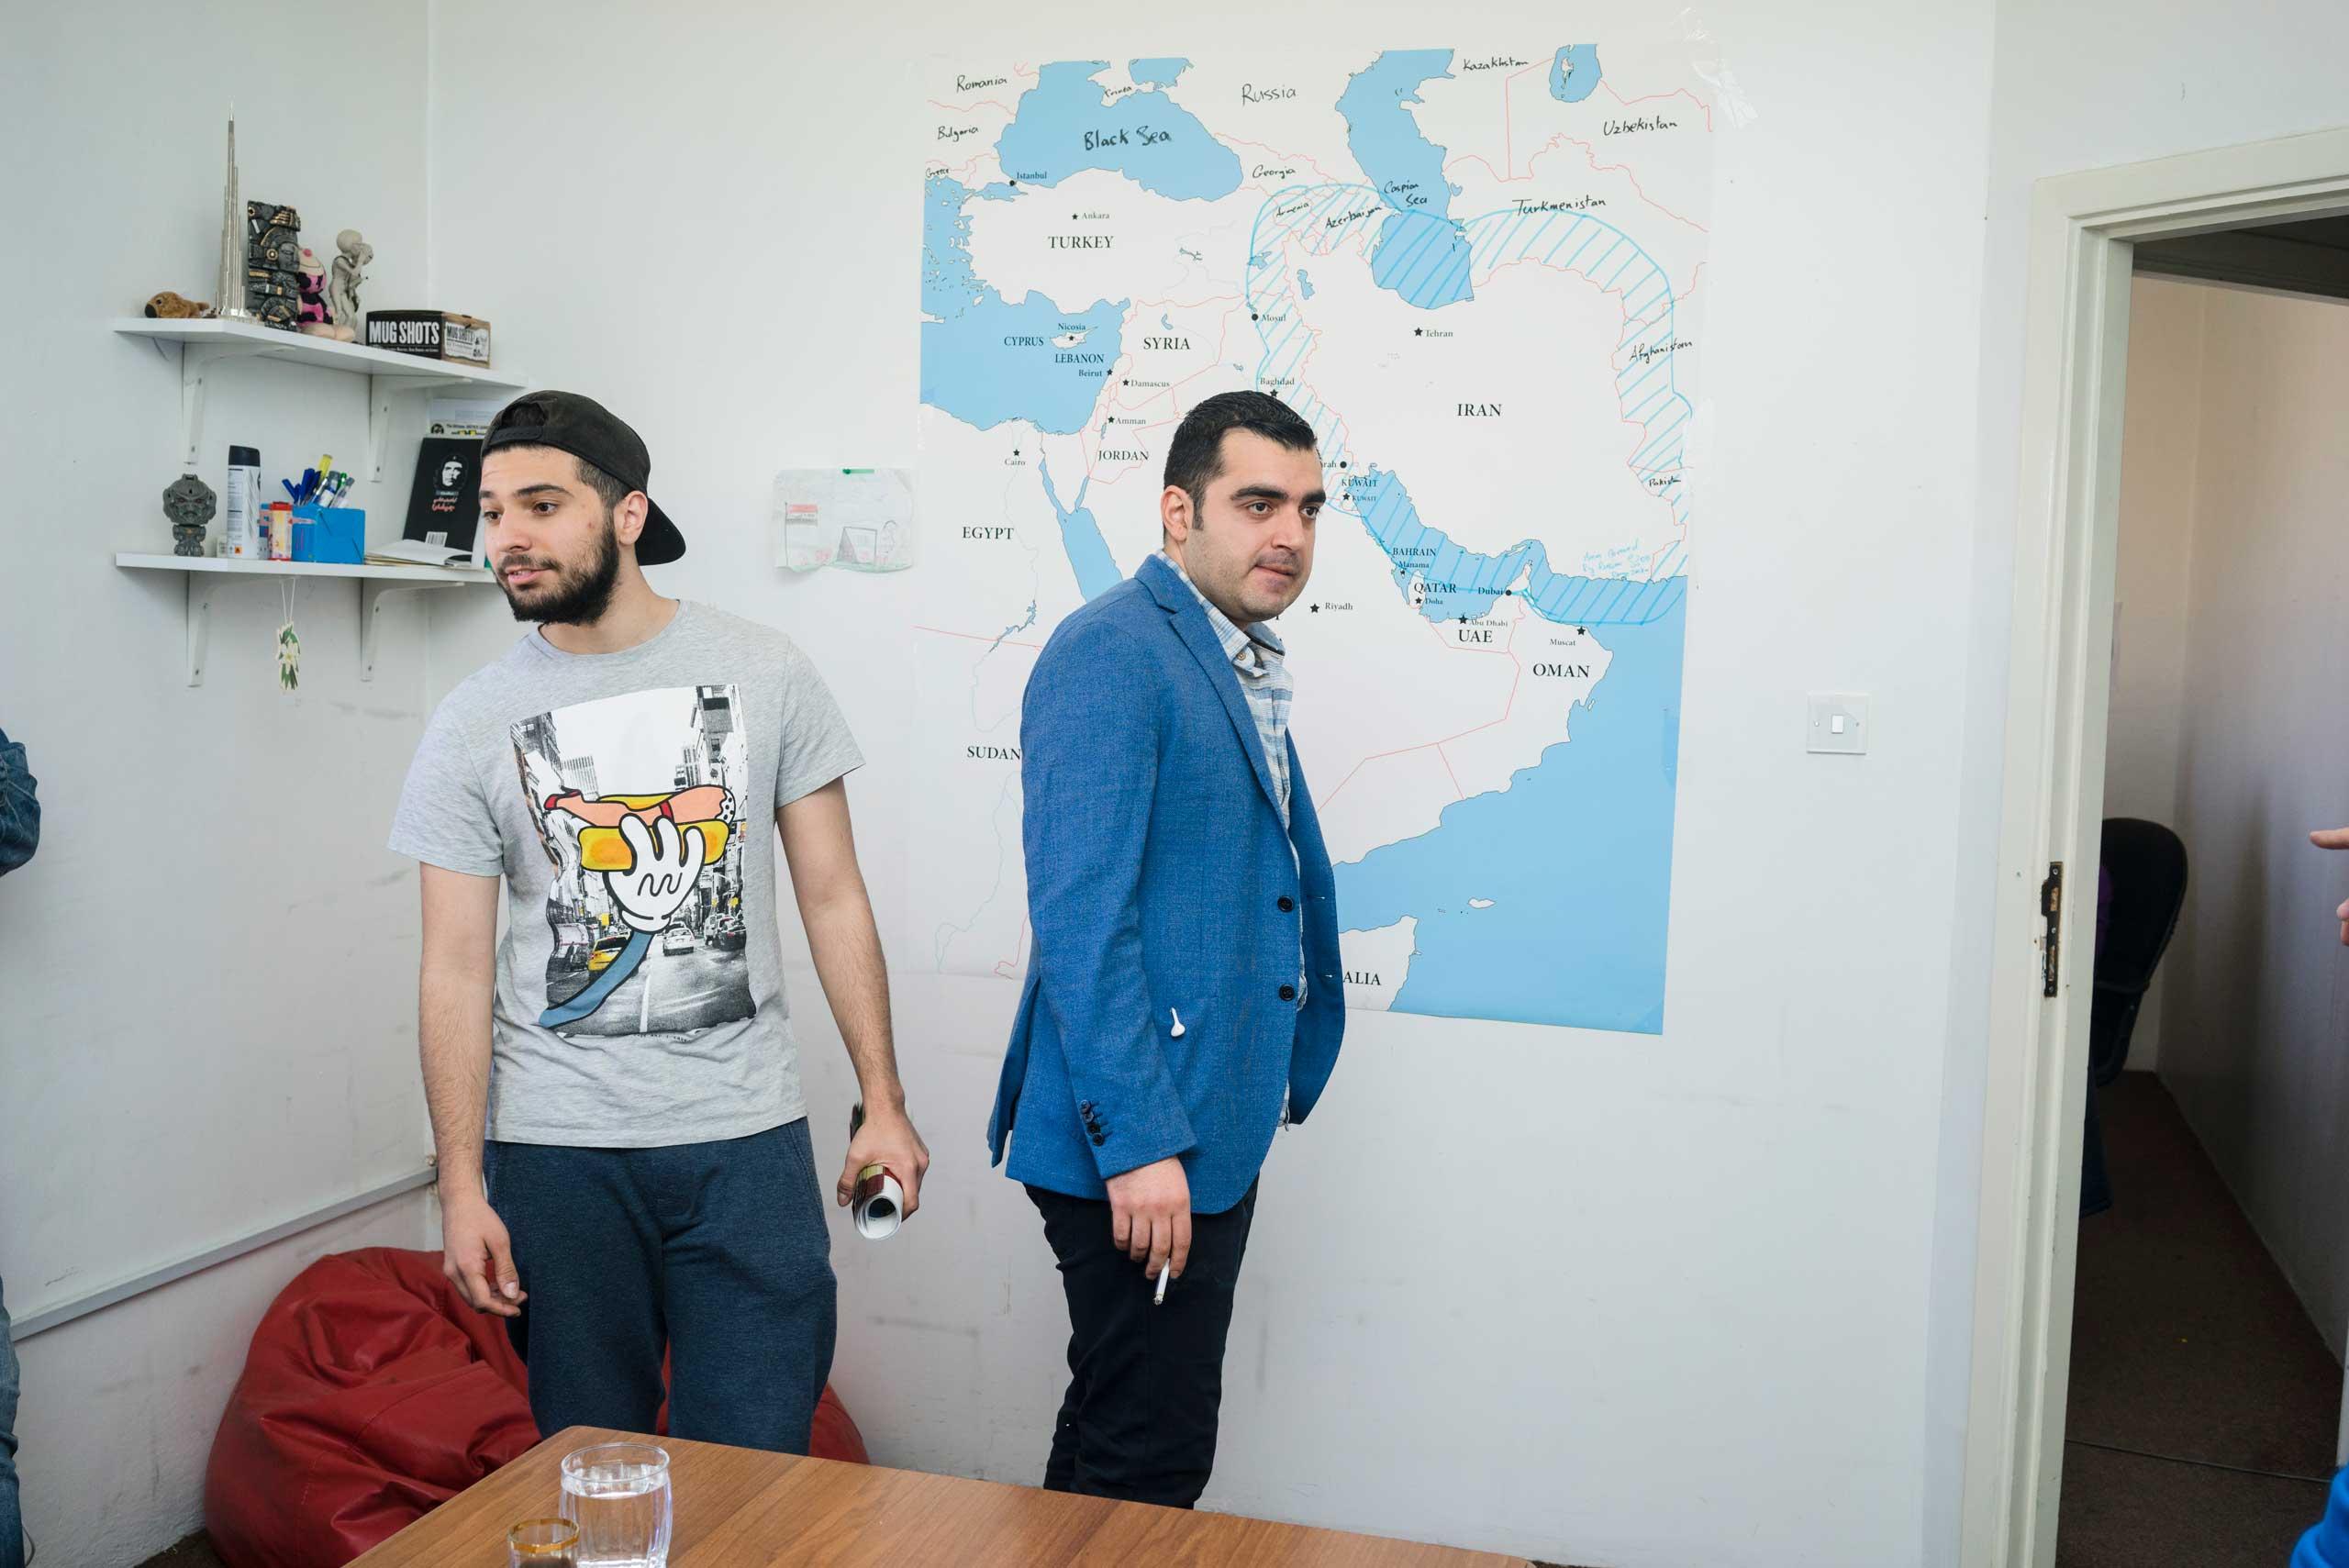 Shwan Sarheng (Left), Ahmad Al-Basheer (Right) at the Al-Basheer show studios in Amman Jordan.